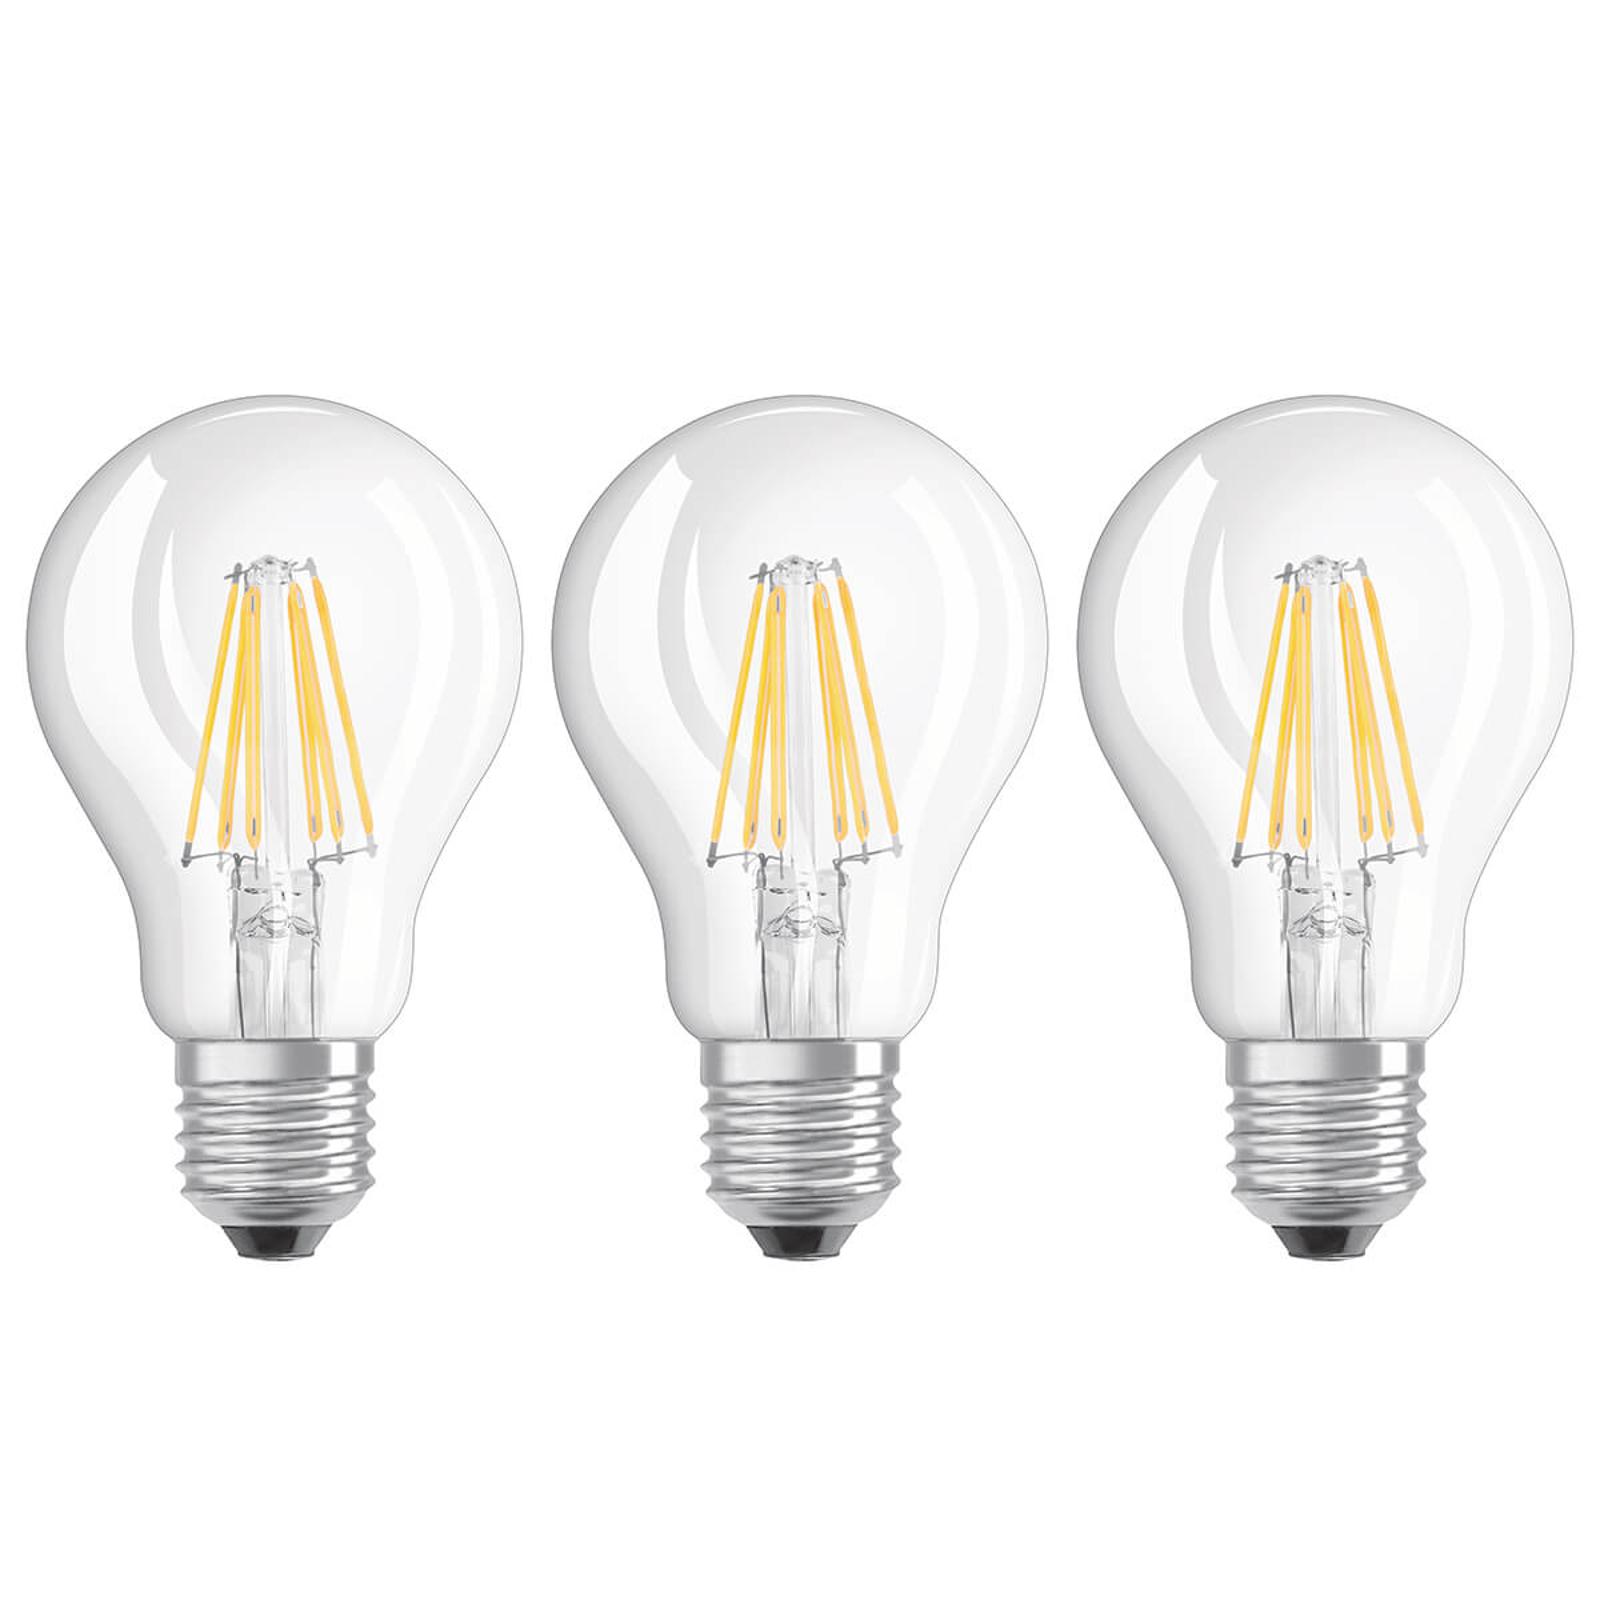 LED-Filamentlampe E27 7W, warmweiß, 3er-Set